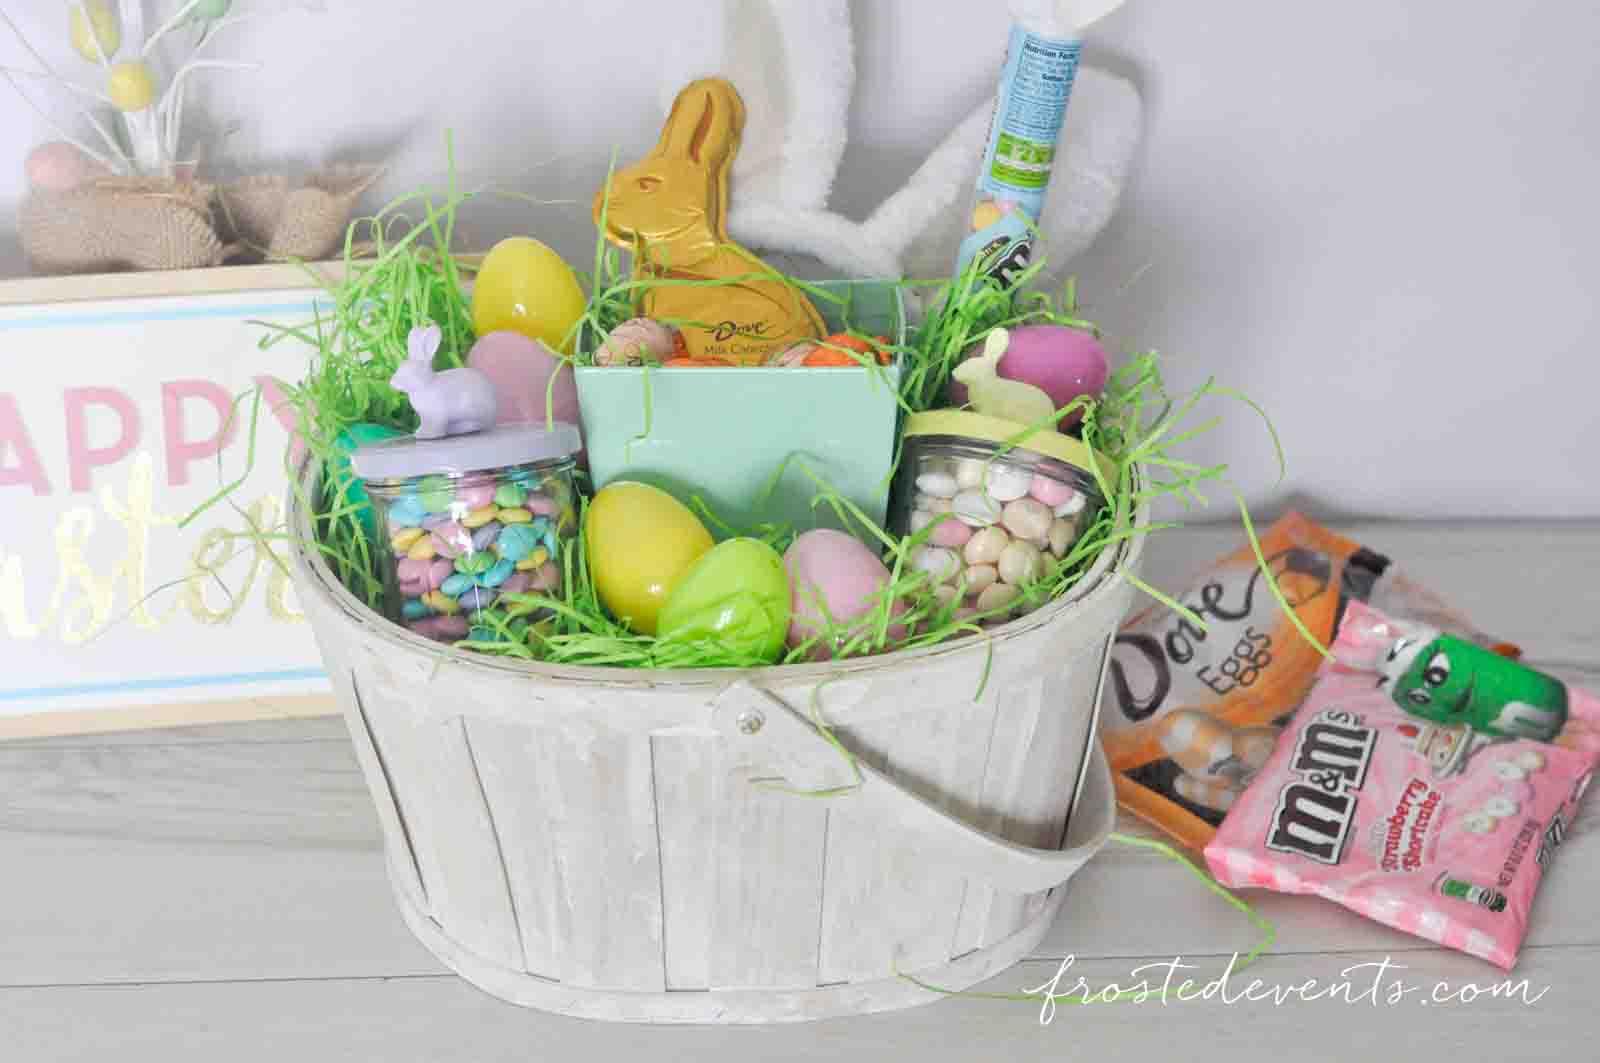 easter-basket-ideas-candy-mars-dove-treats-free-printable-12